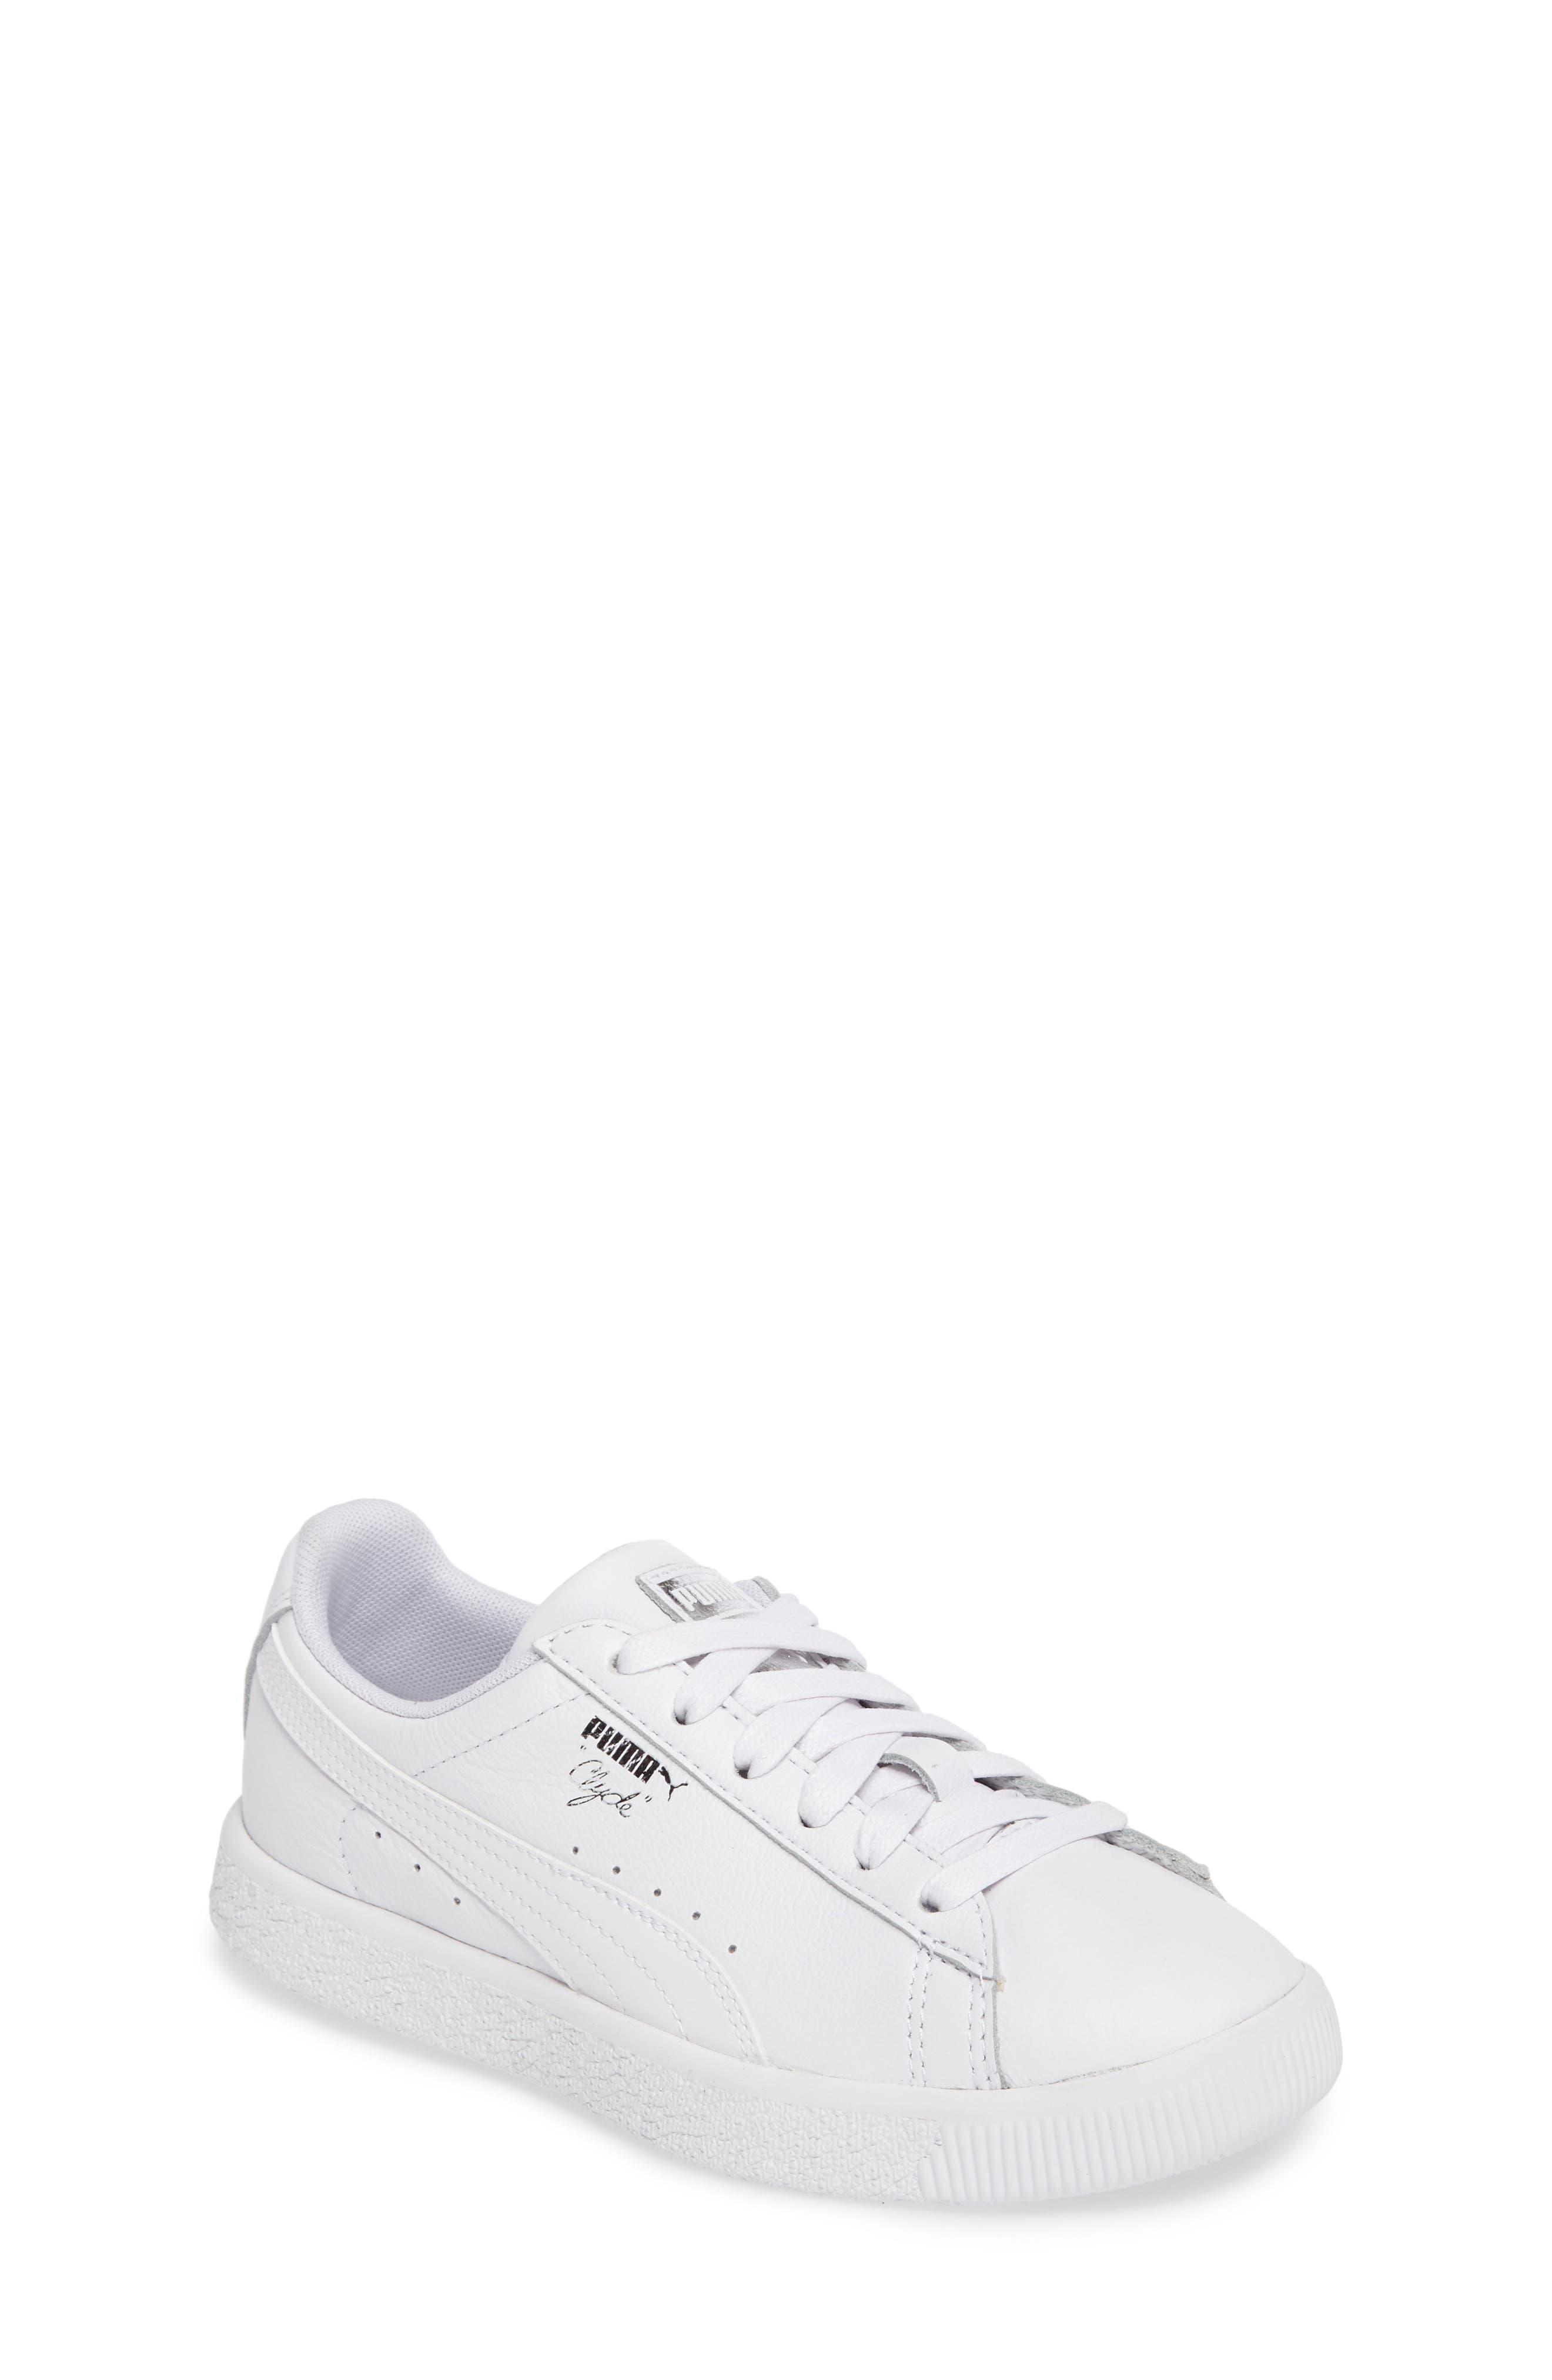 Clyde Core Foil Sneaker,                         Main,                         color, White/ White